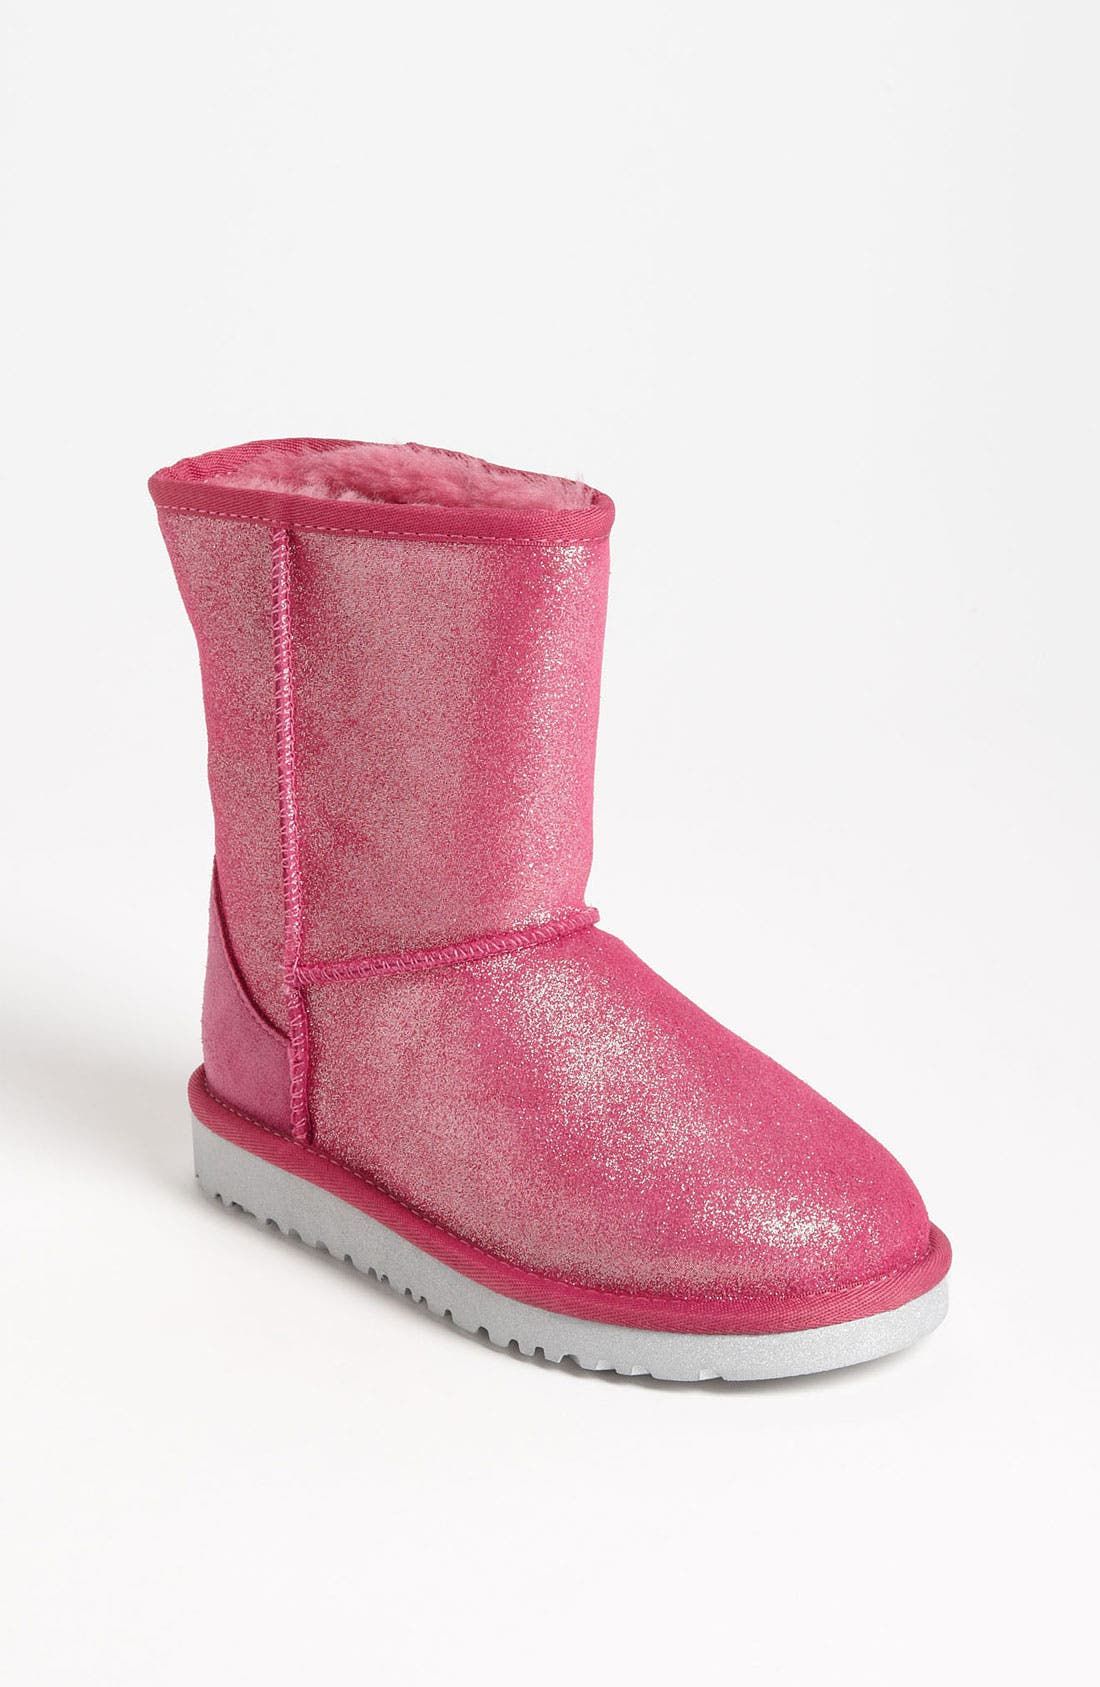 Main Image - UGG® Australia 'Classic Glitter' Boot (Walker, Toddler, Little Kid & Big Kid)